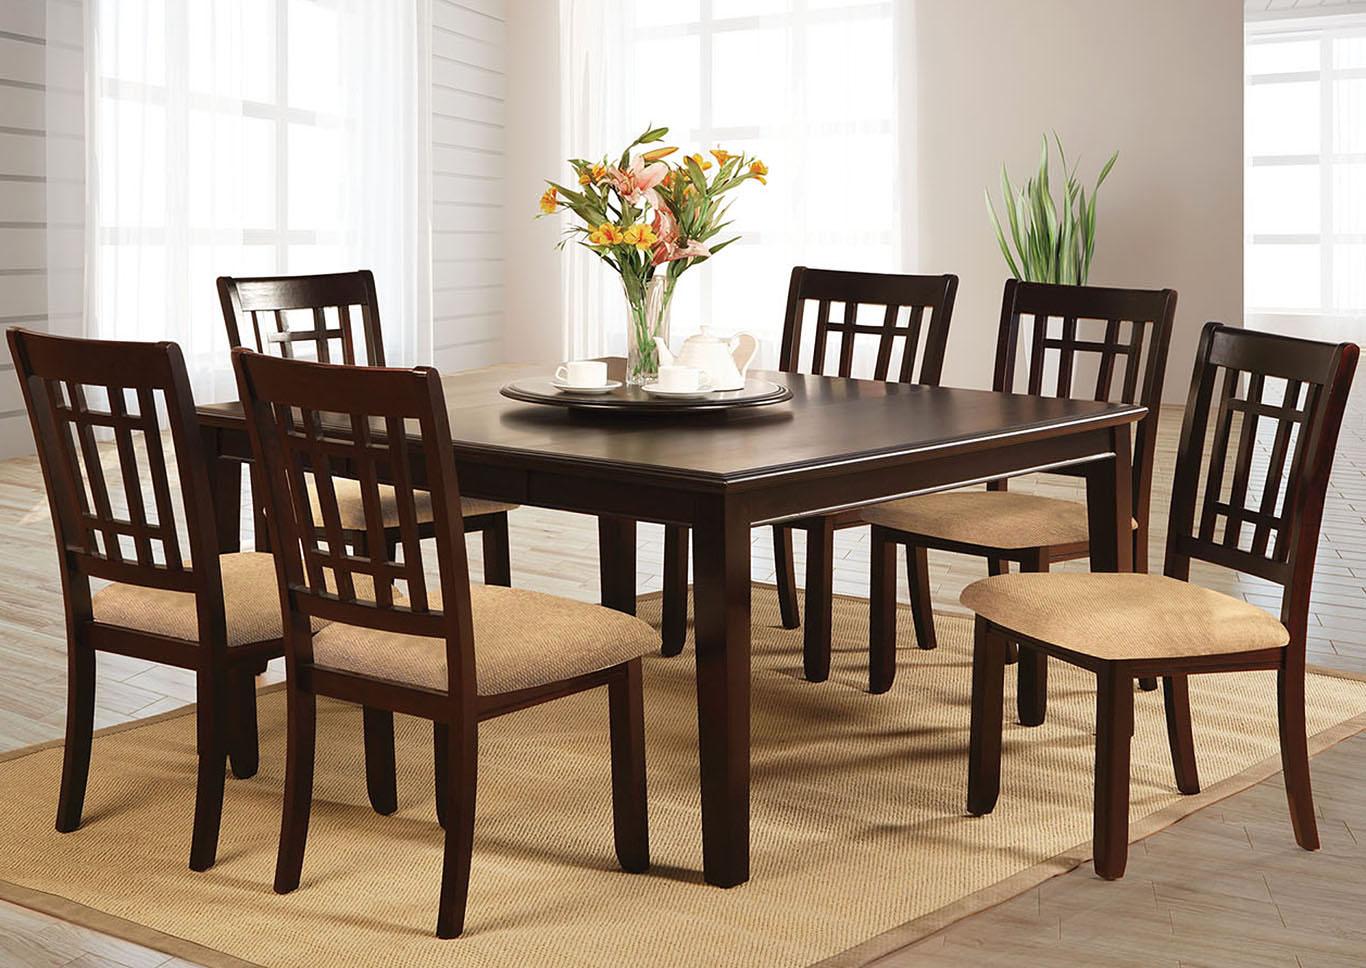 Squan Furniture Central Park L Extension Leaf Dining Table